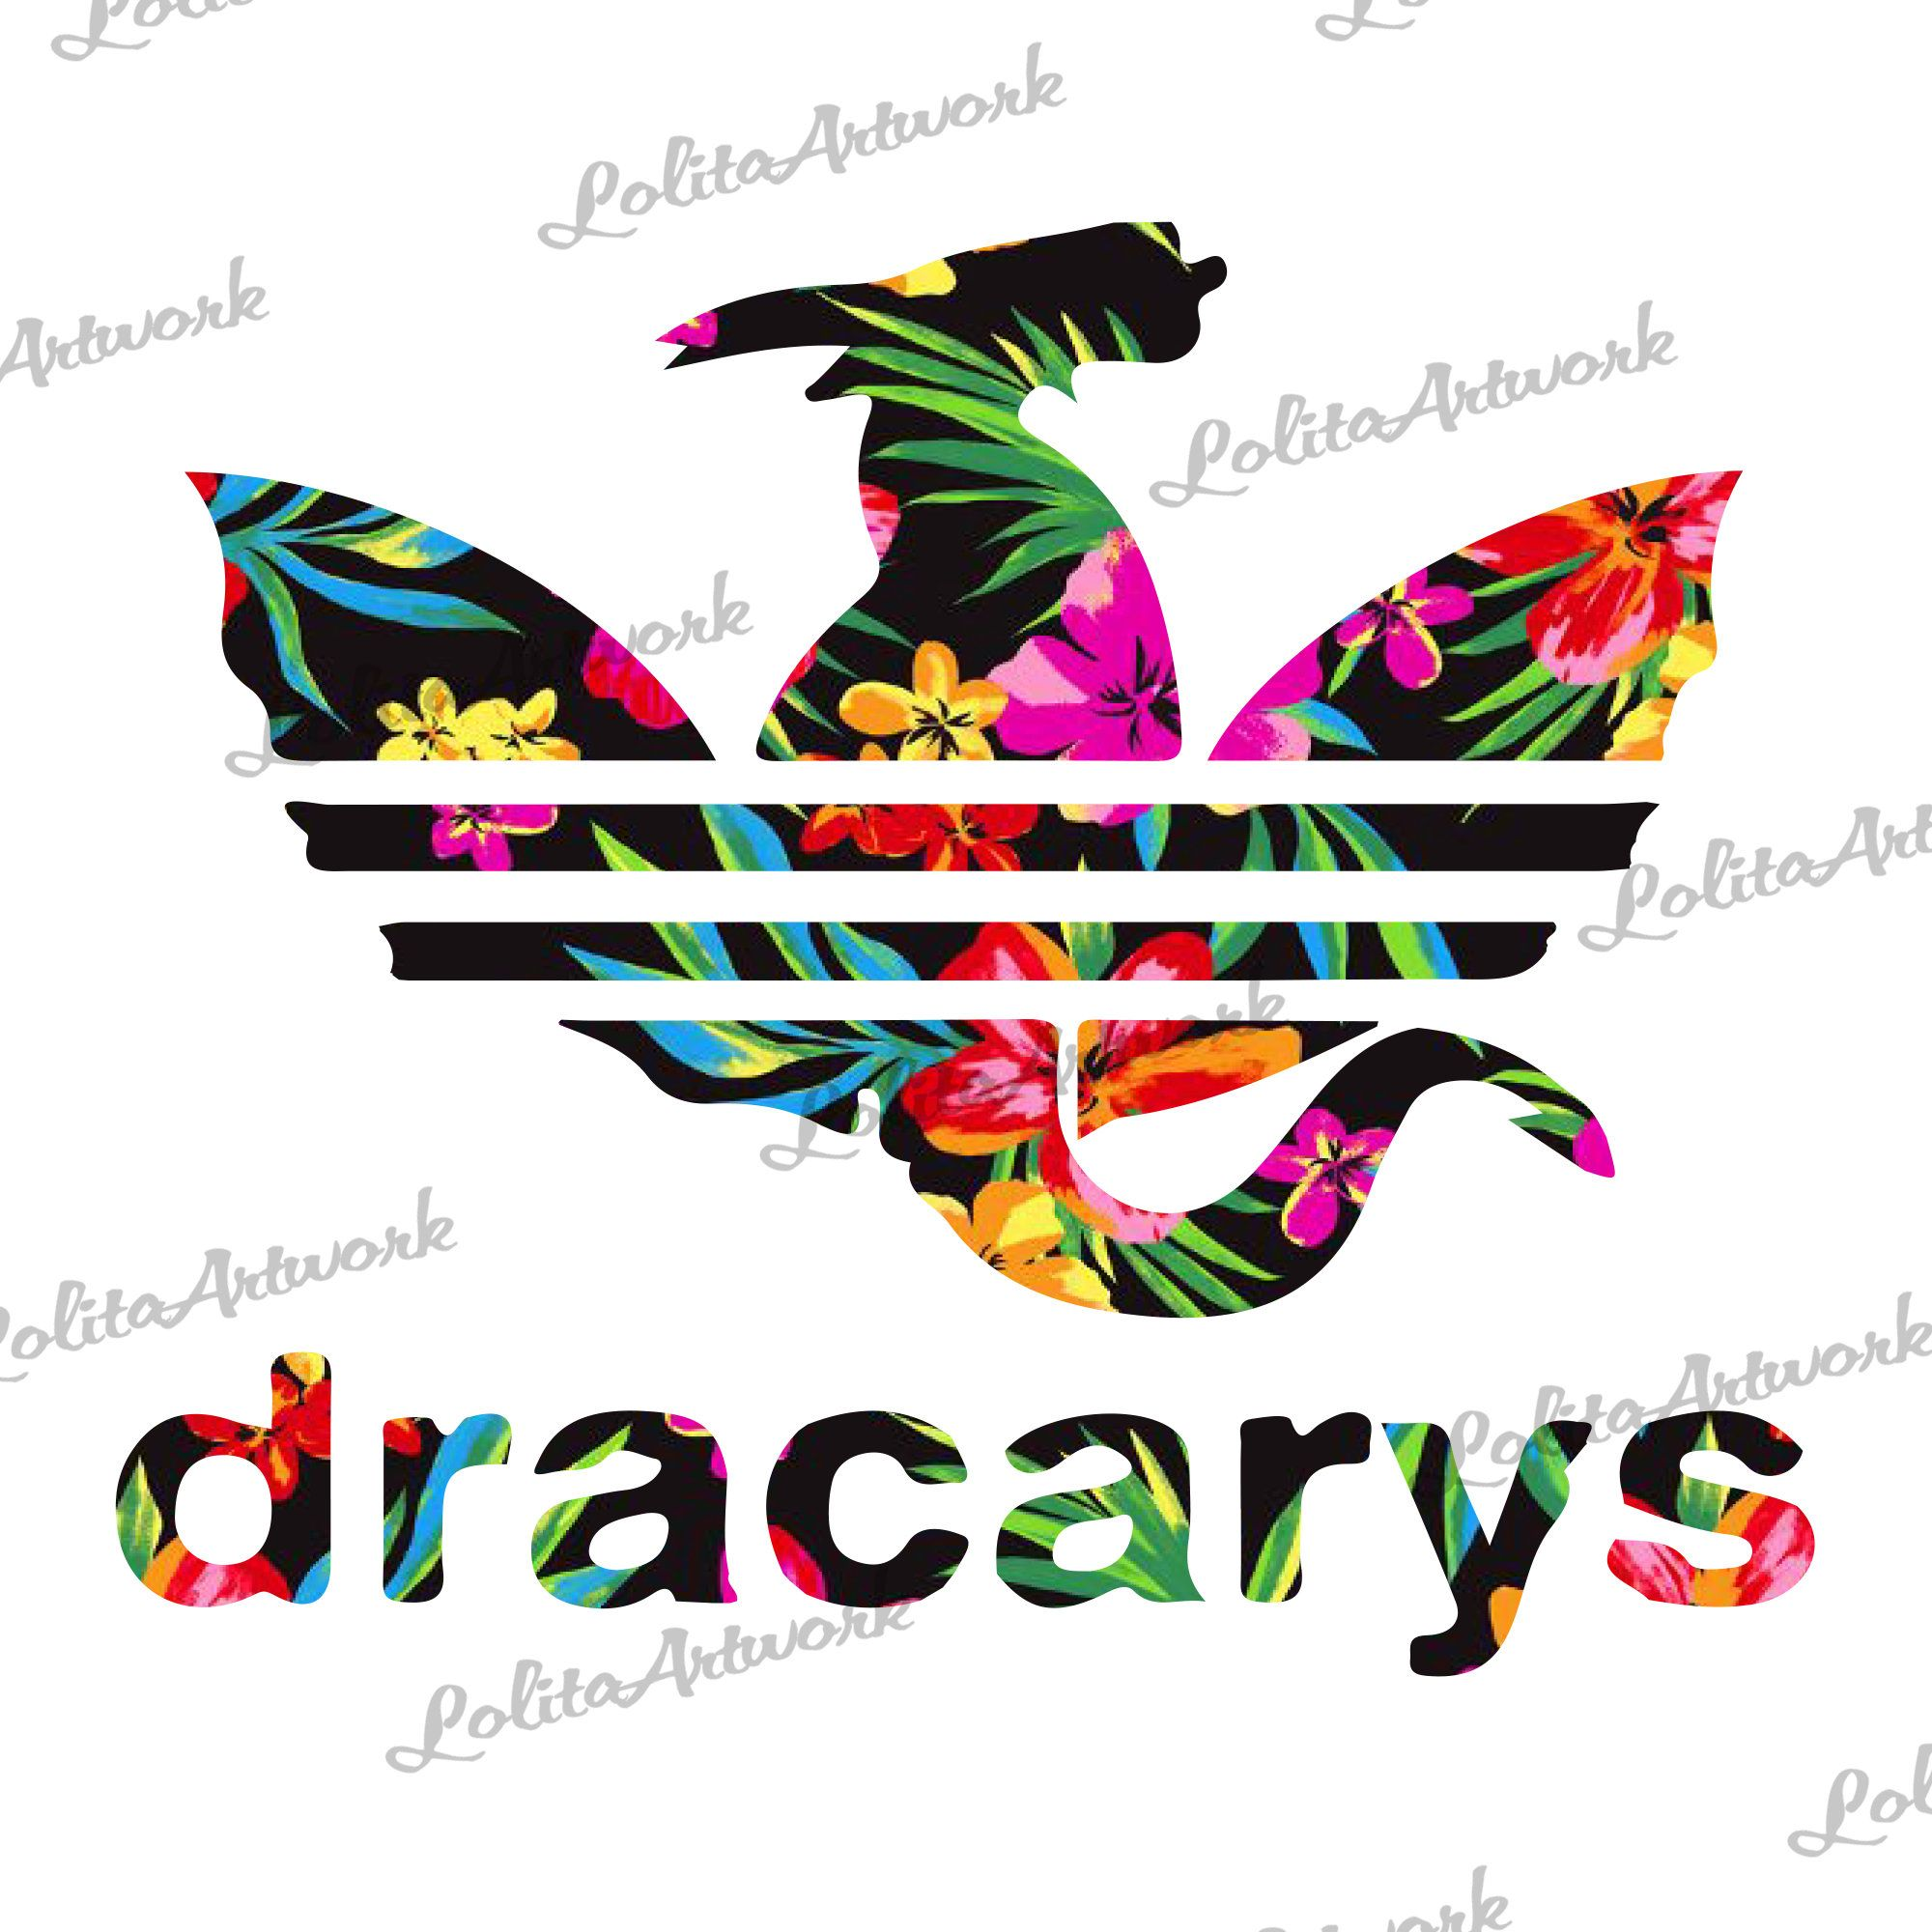 Brillante Temporada Ardilla  dostižan zajednica lako se ozlijediti dracarys t shirt adidas png logo -  tedxdharavi.com